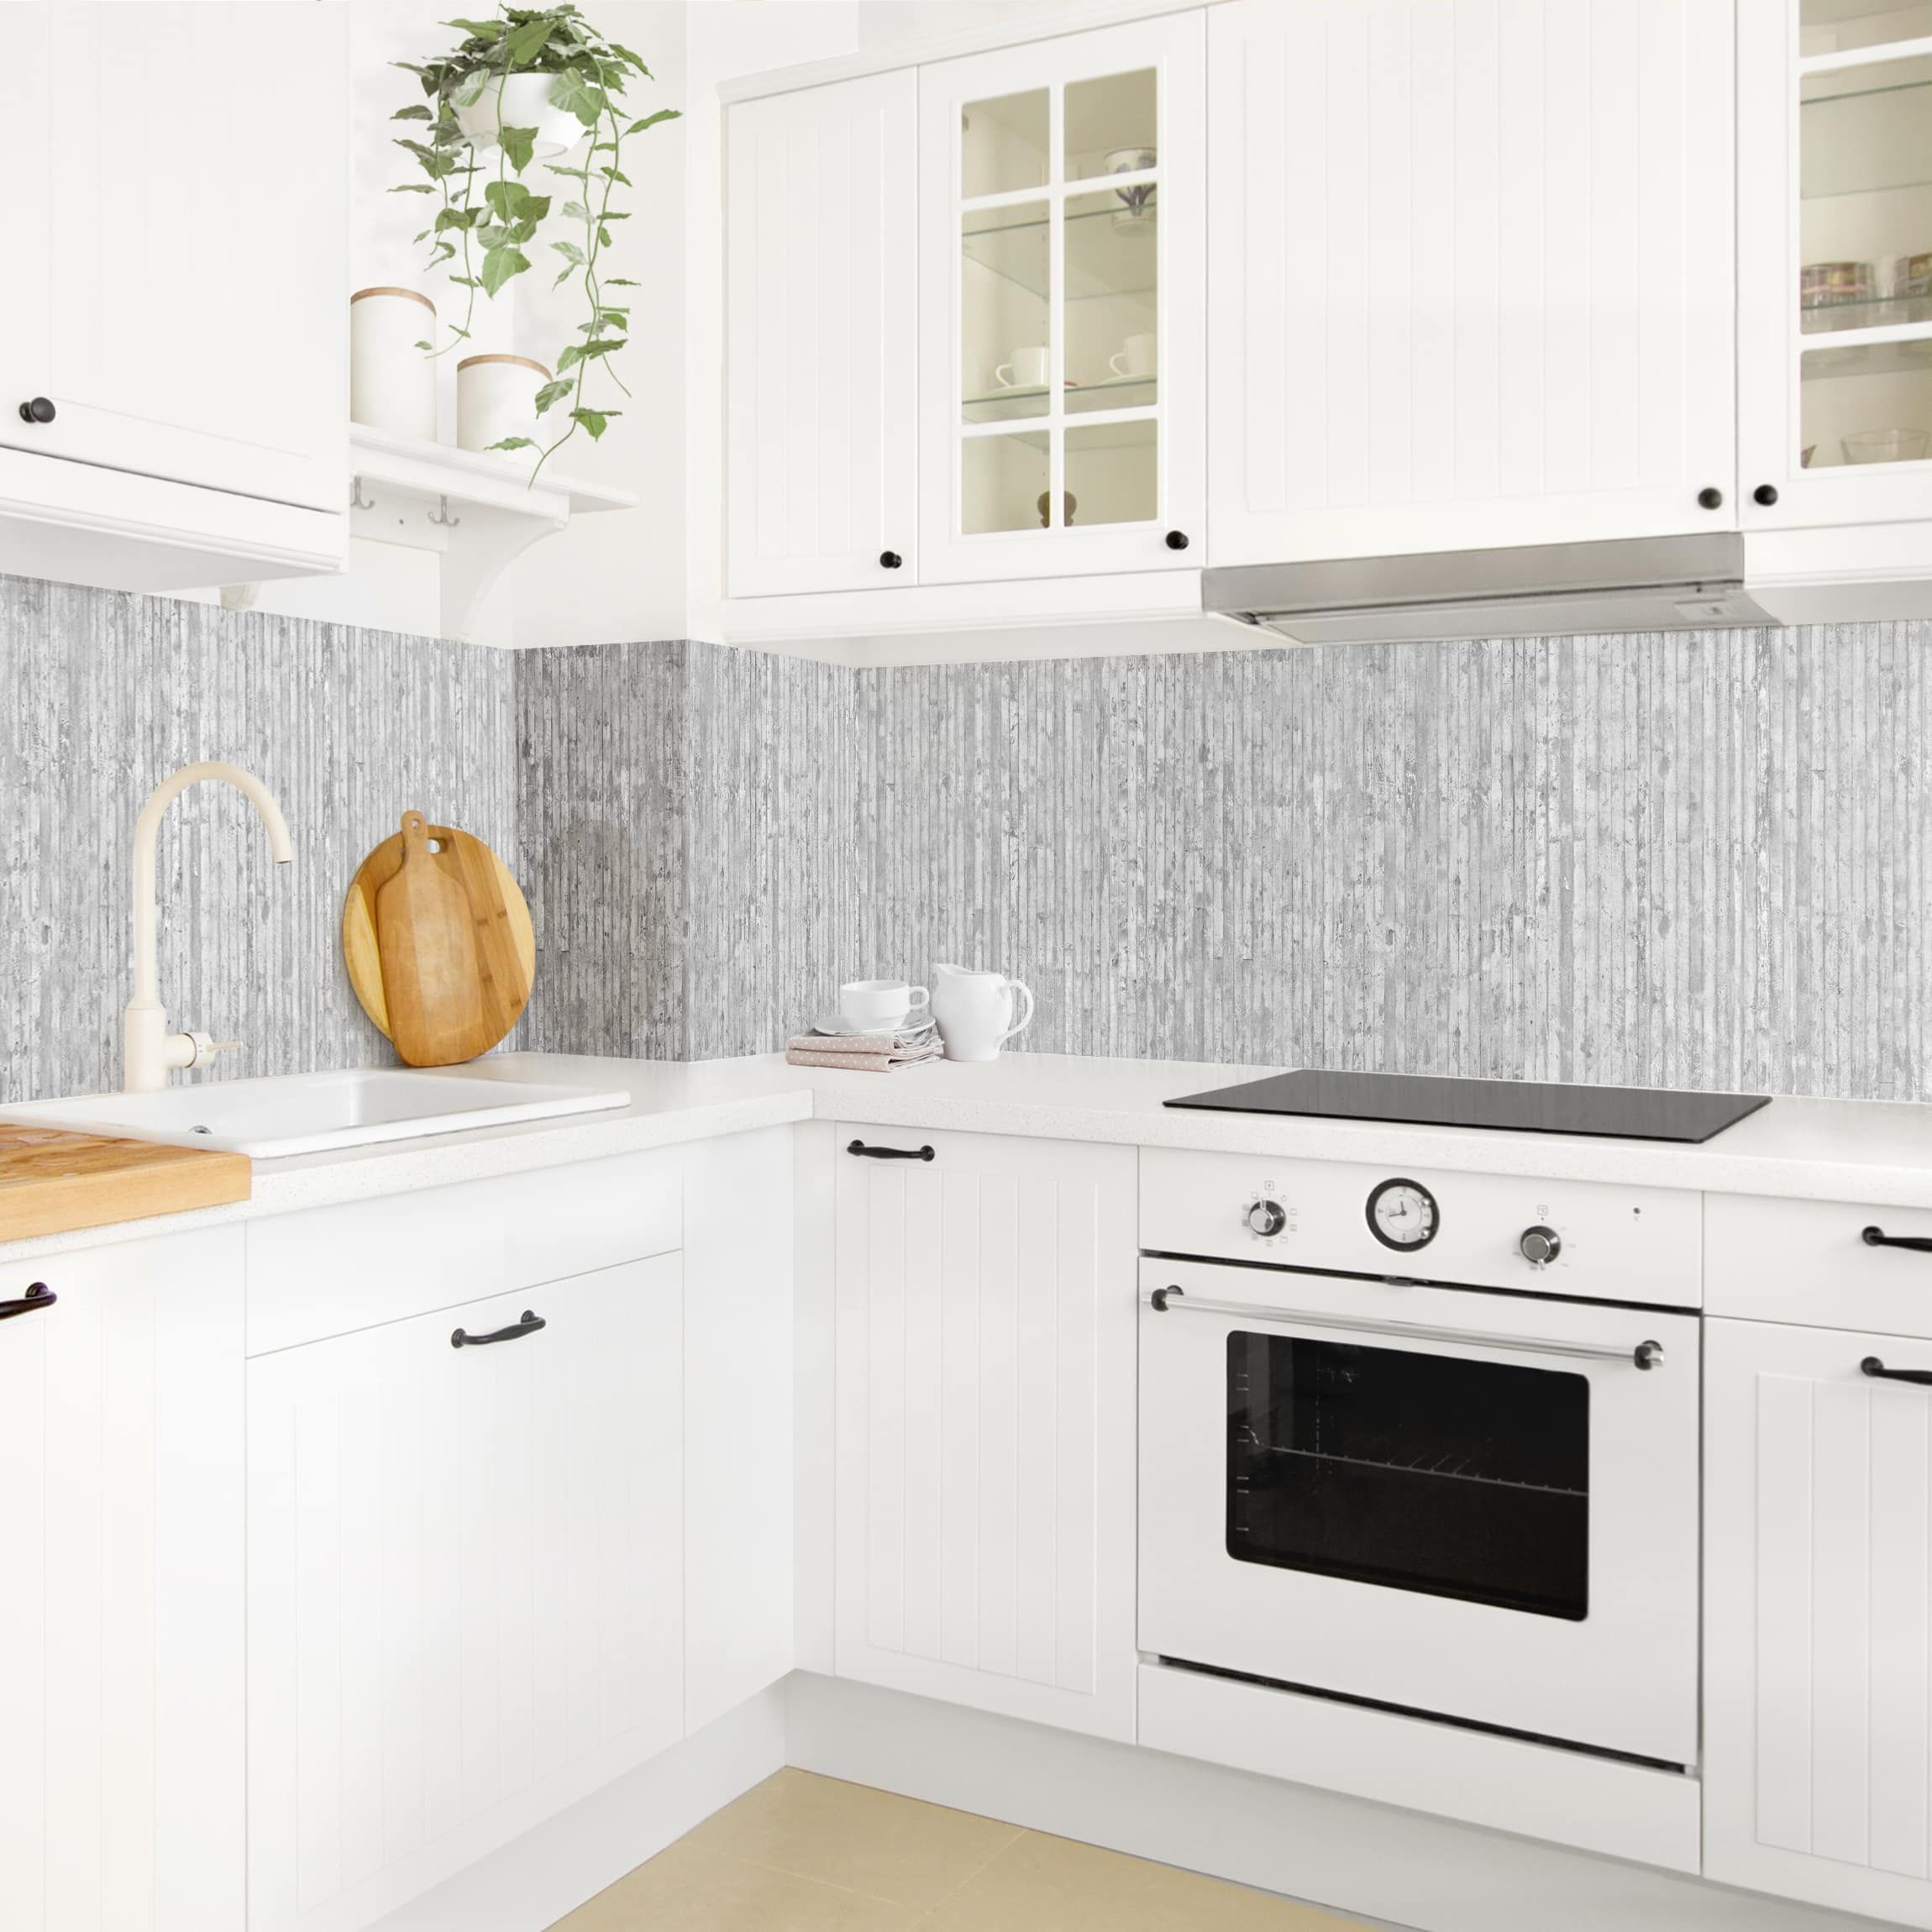 Rivestimento cucina - Effetto cemento strisciato ...